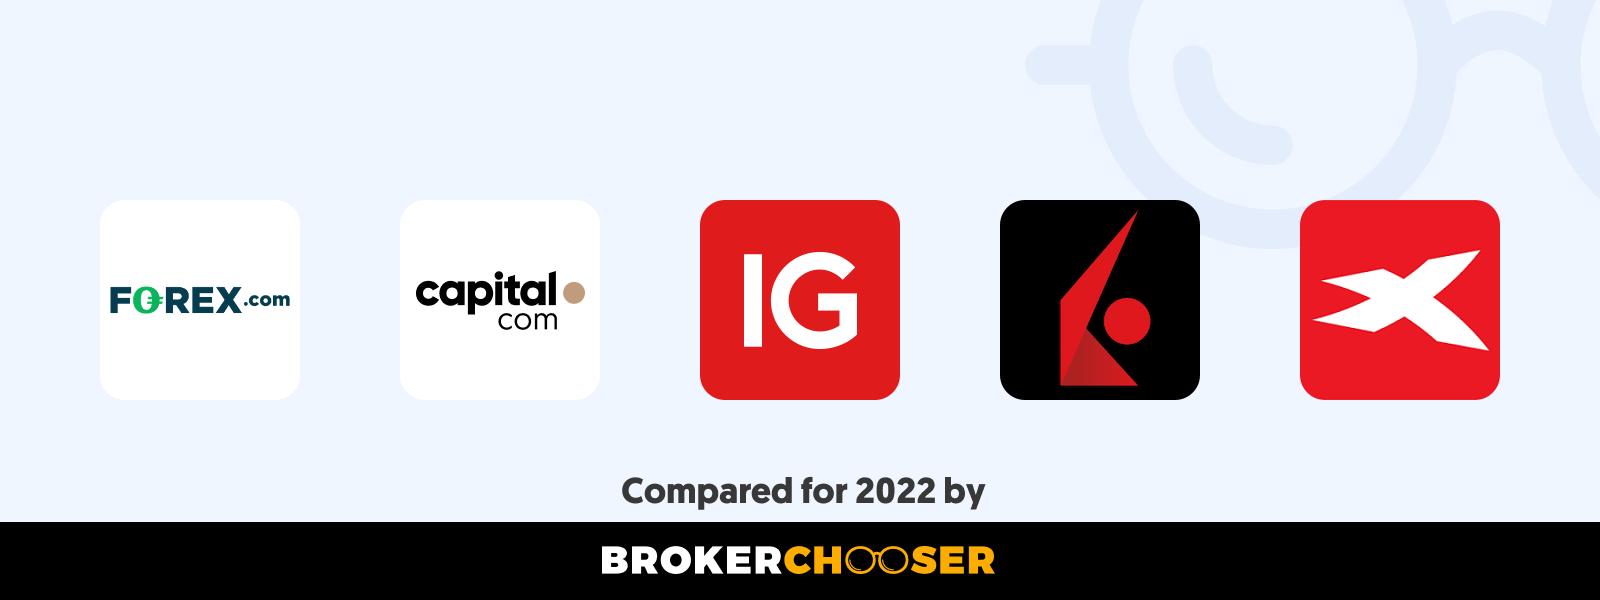 Best forex brokers for beginners in Antigua & Barbuda in 2021